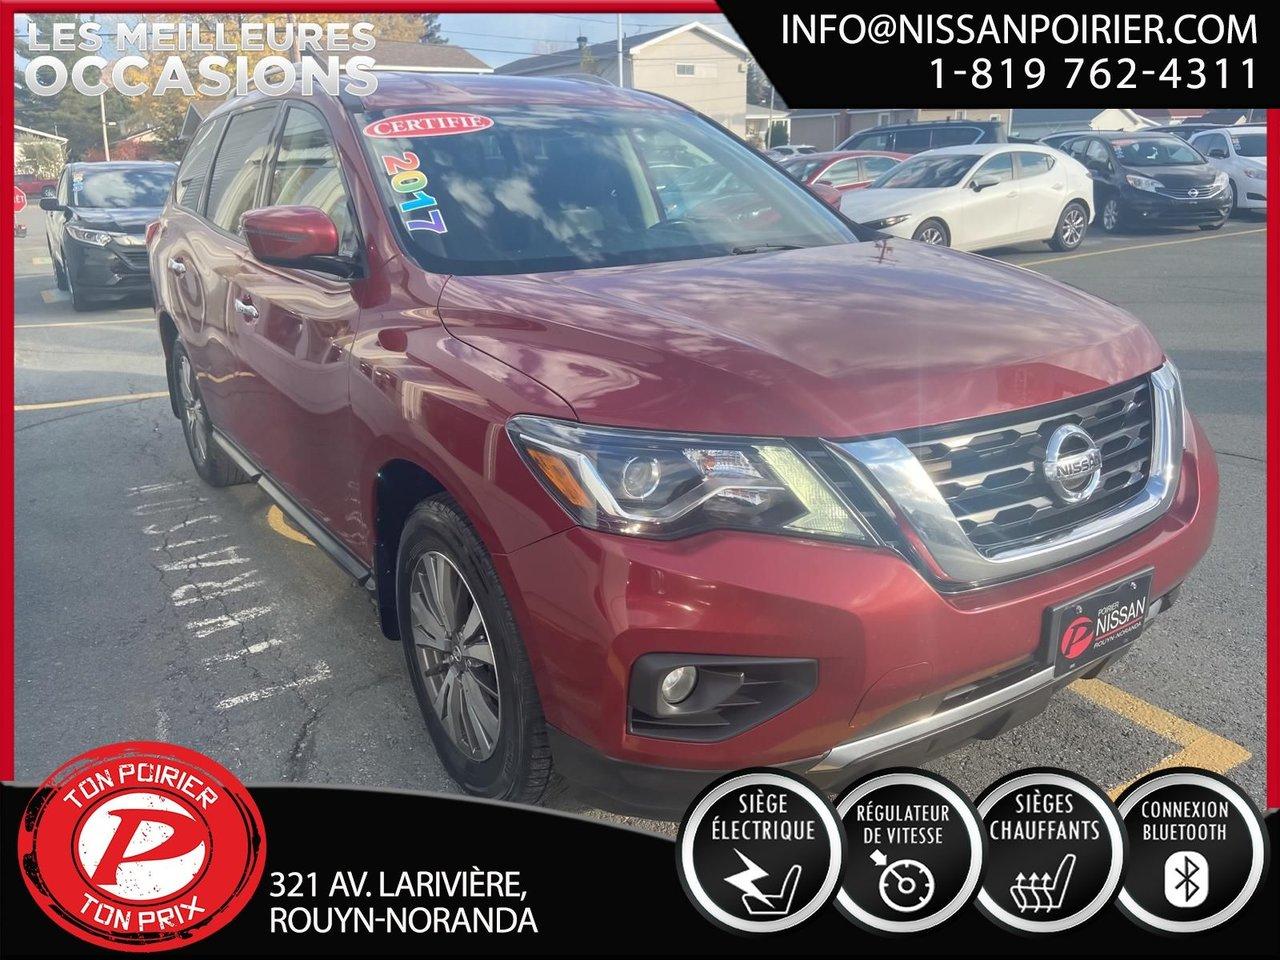 Nissan Pathfinder 2017 SV AWD